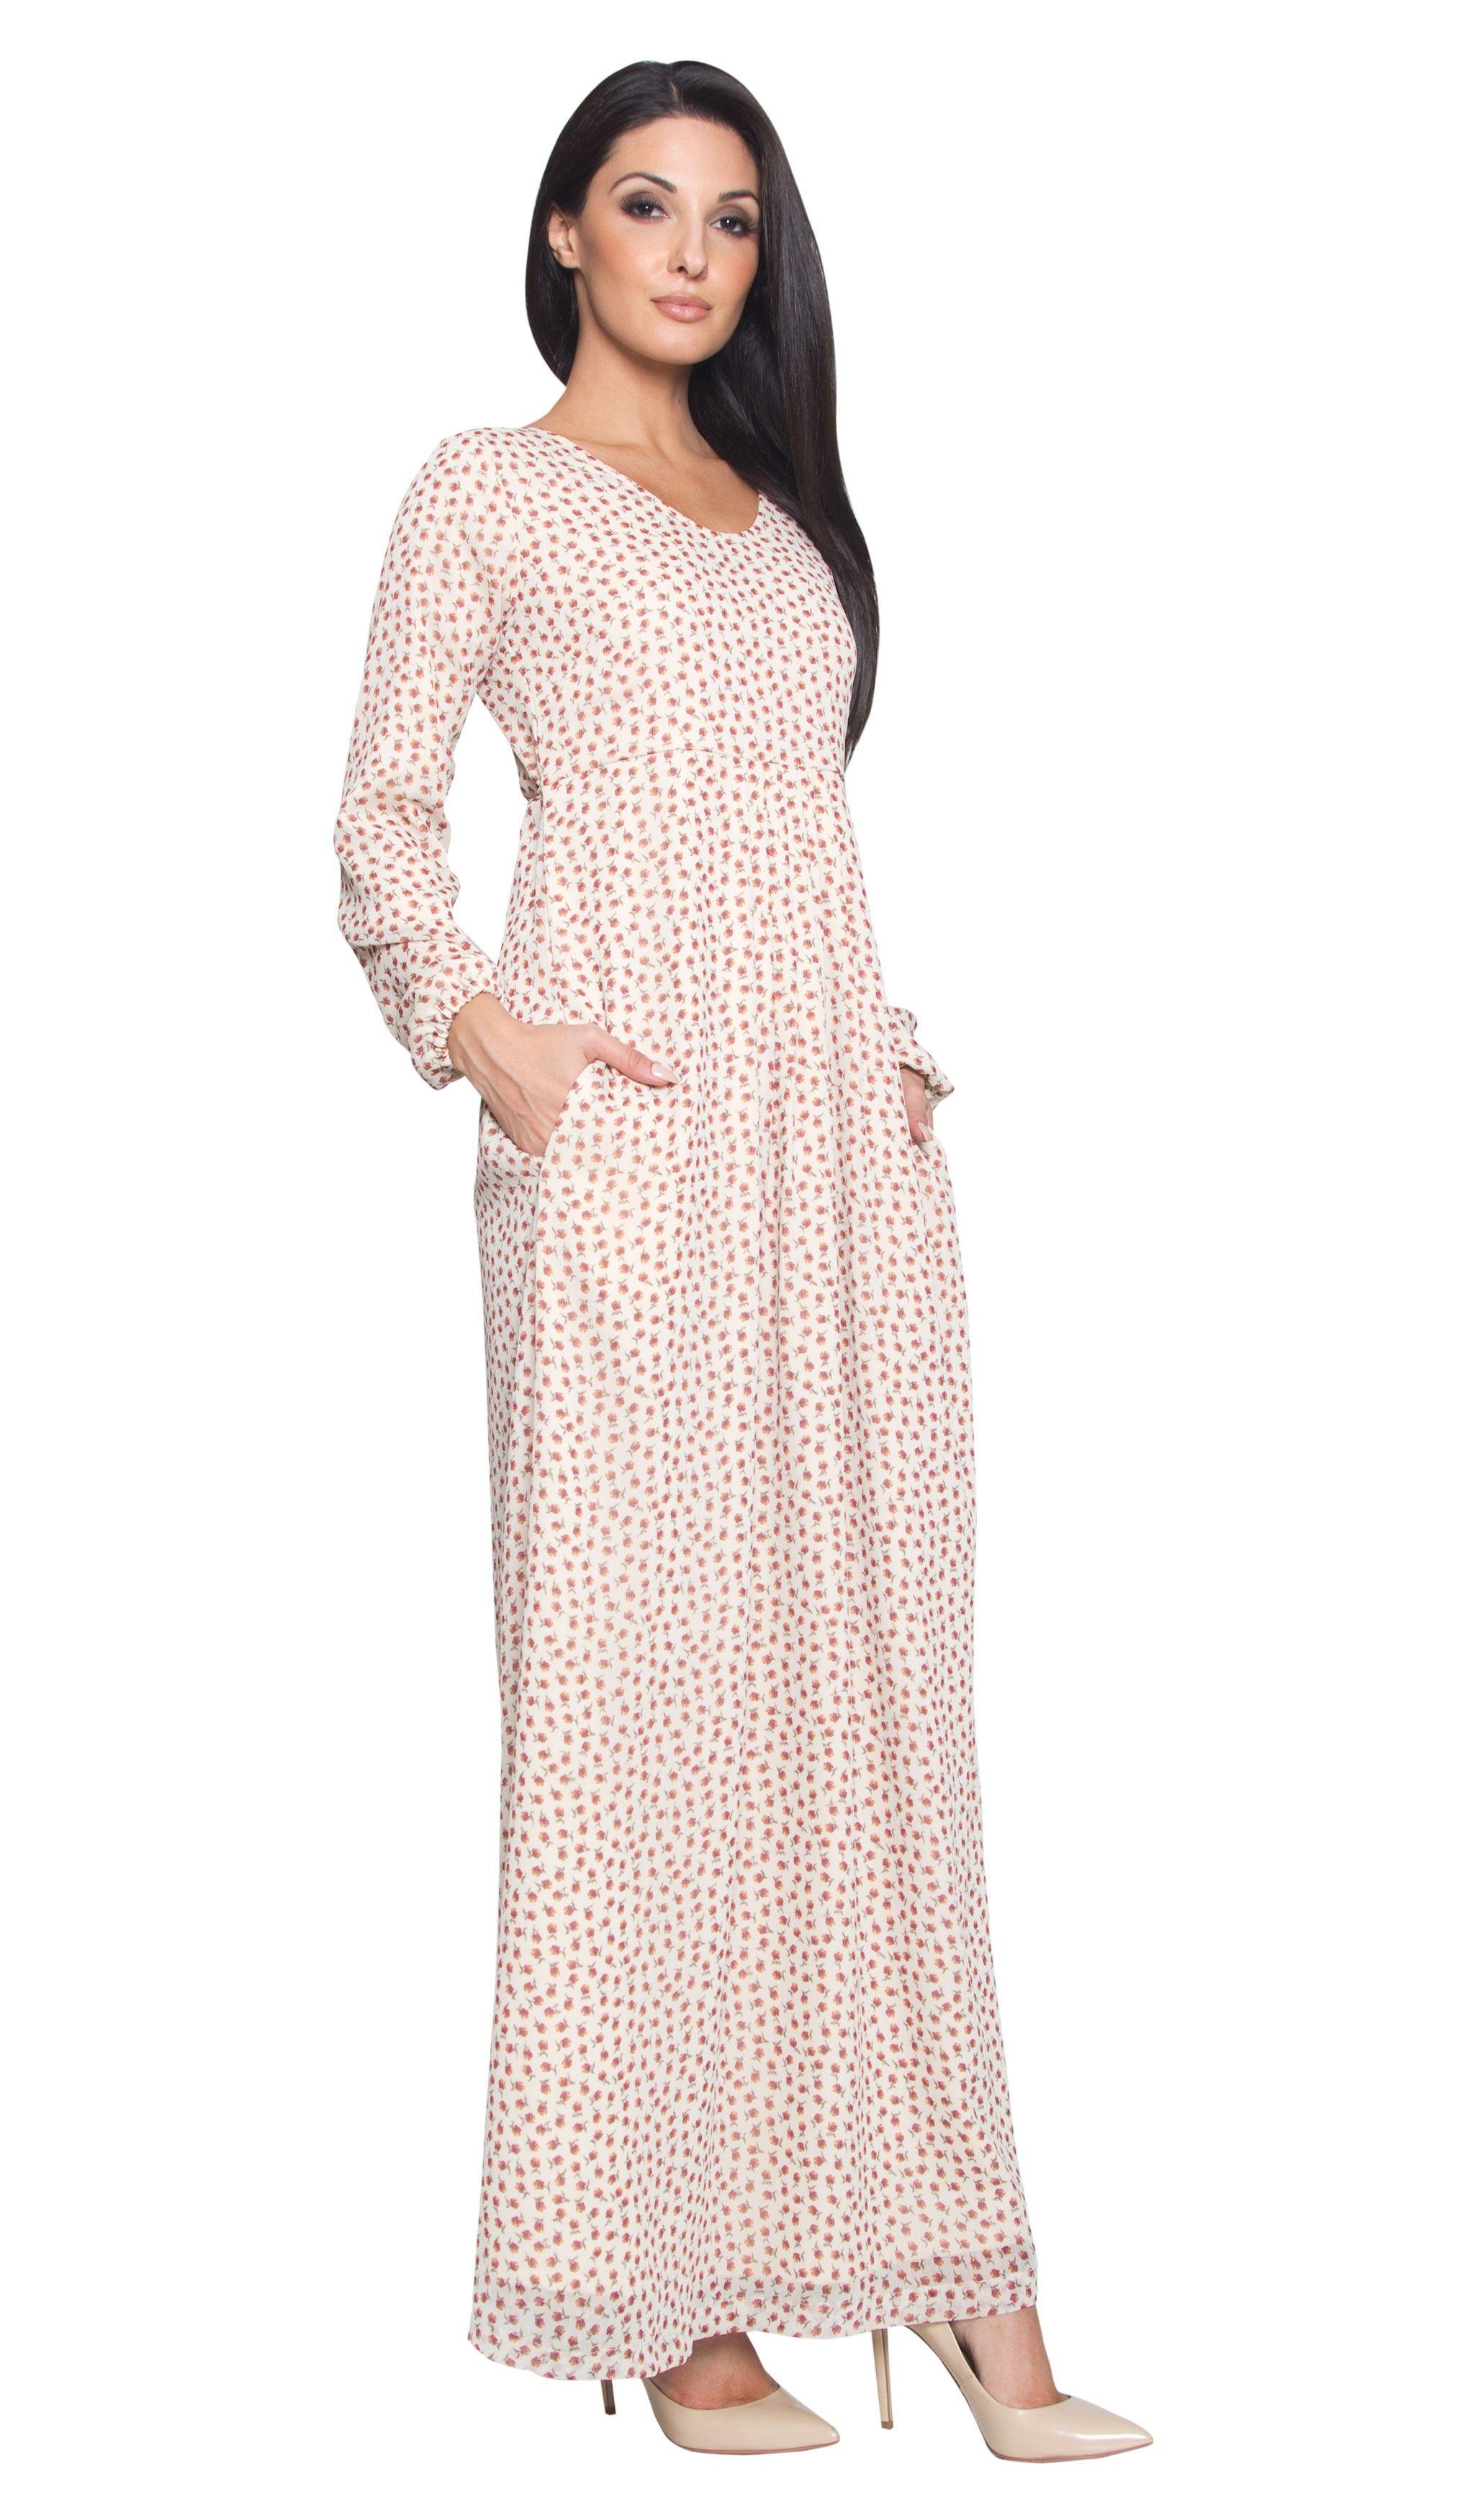 Tan Floral Print Chiffon Long Sleeve Modest Maxi Dress Abayas Kaftans Maxi Dresses And Long Sleeve Dresses Modest Maxi Dress Chiffon Long Sleeve Maxi Dress [ 3500 x 2042 Pixel ]